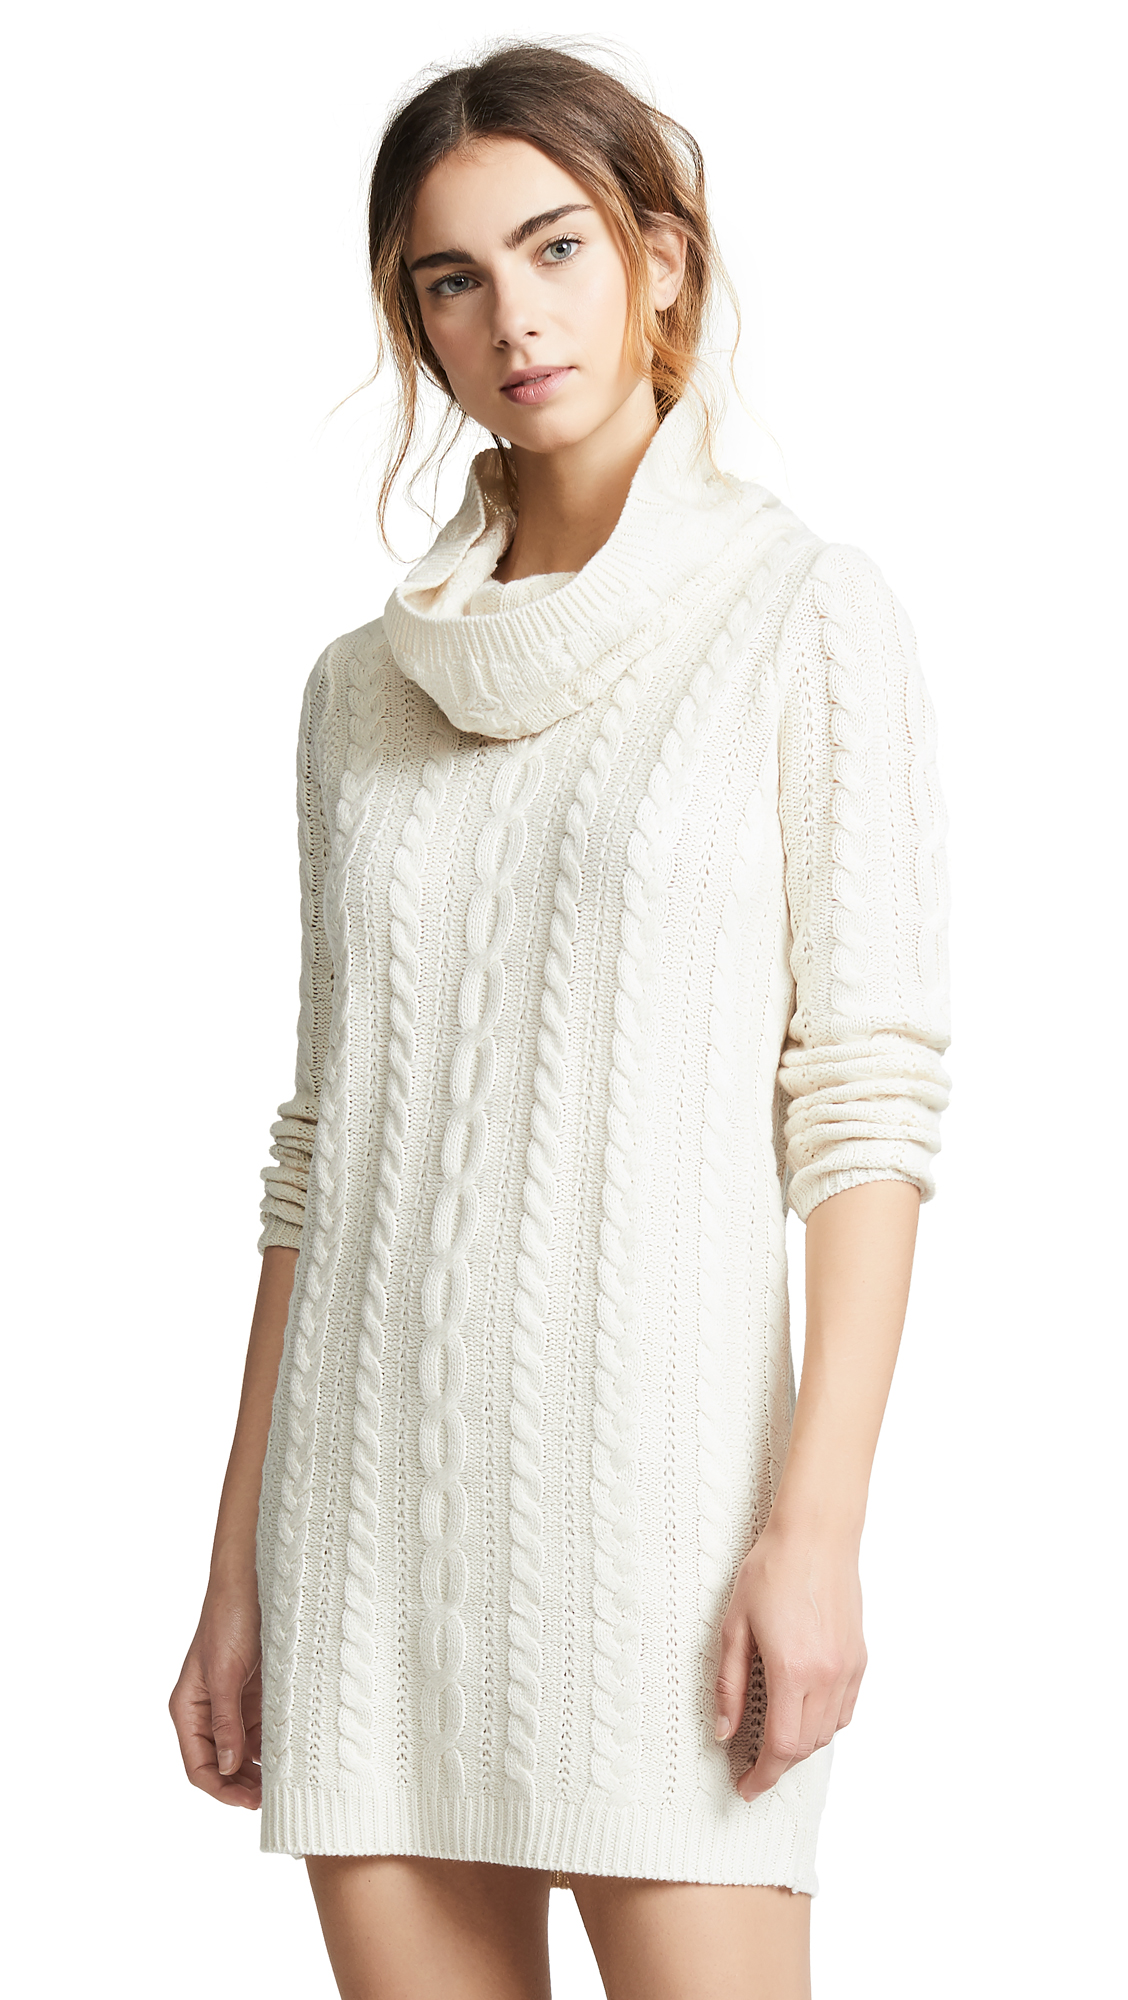 BB Dakota Alaska Sweater Dress - Oatmeal